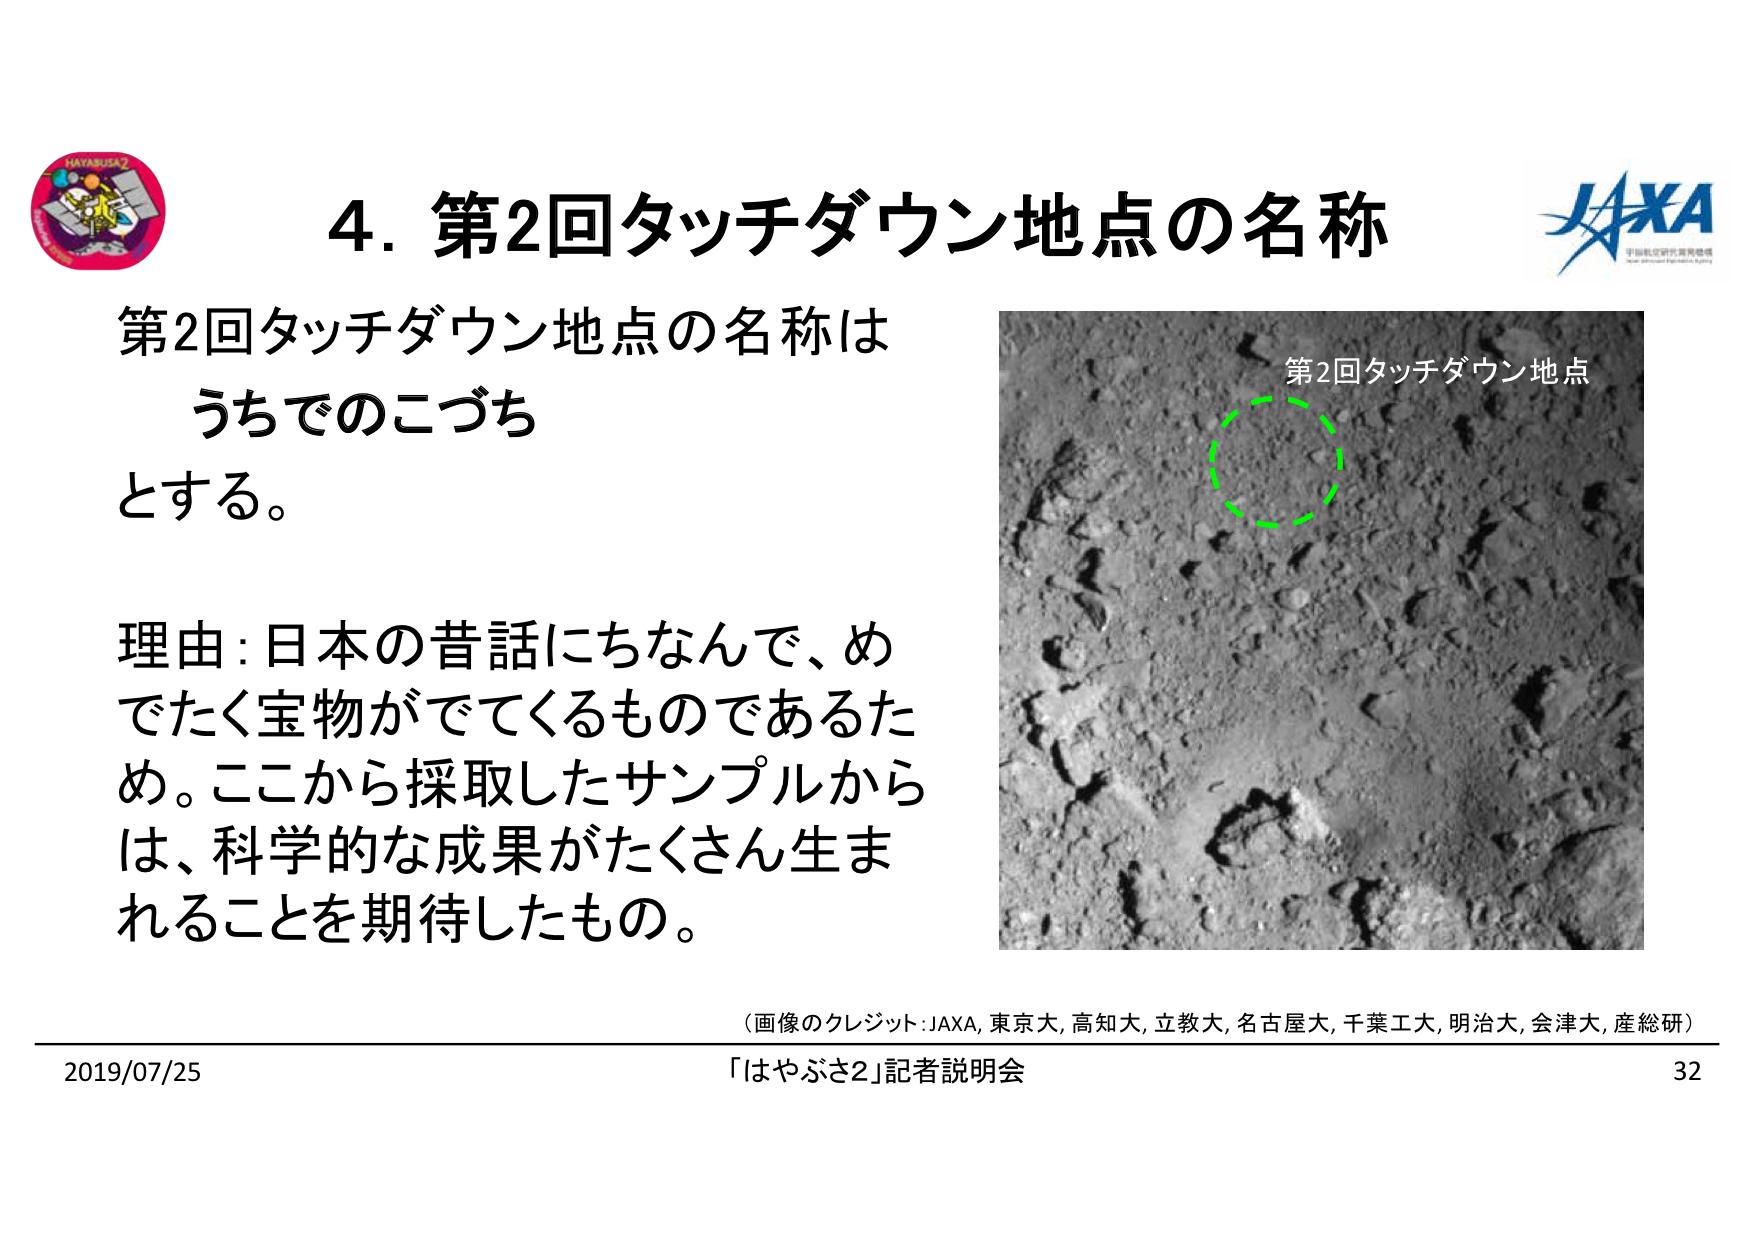 f:id:Imamura:20190725151409p:plain